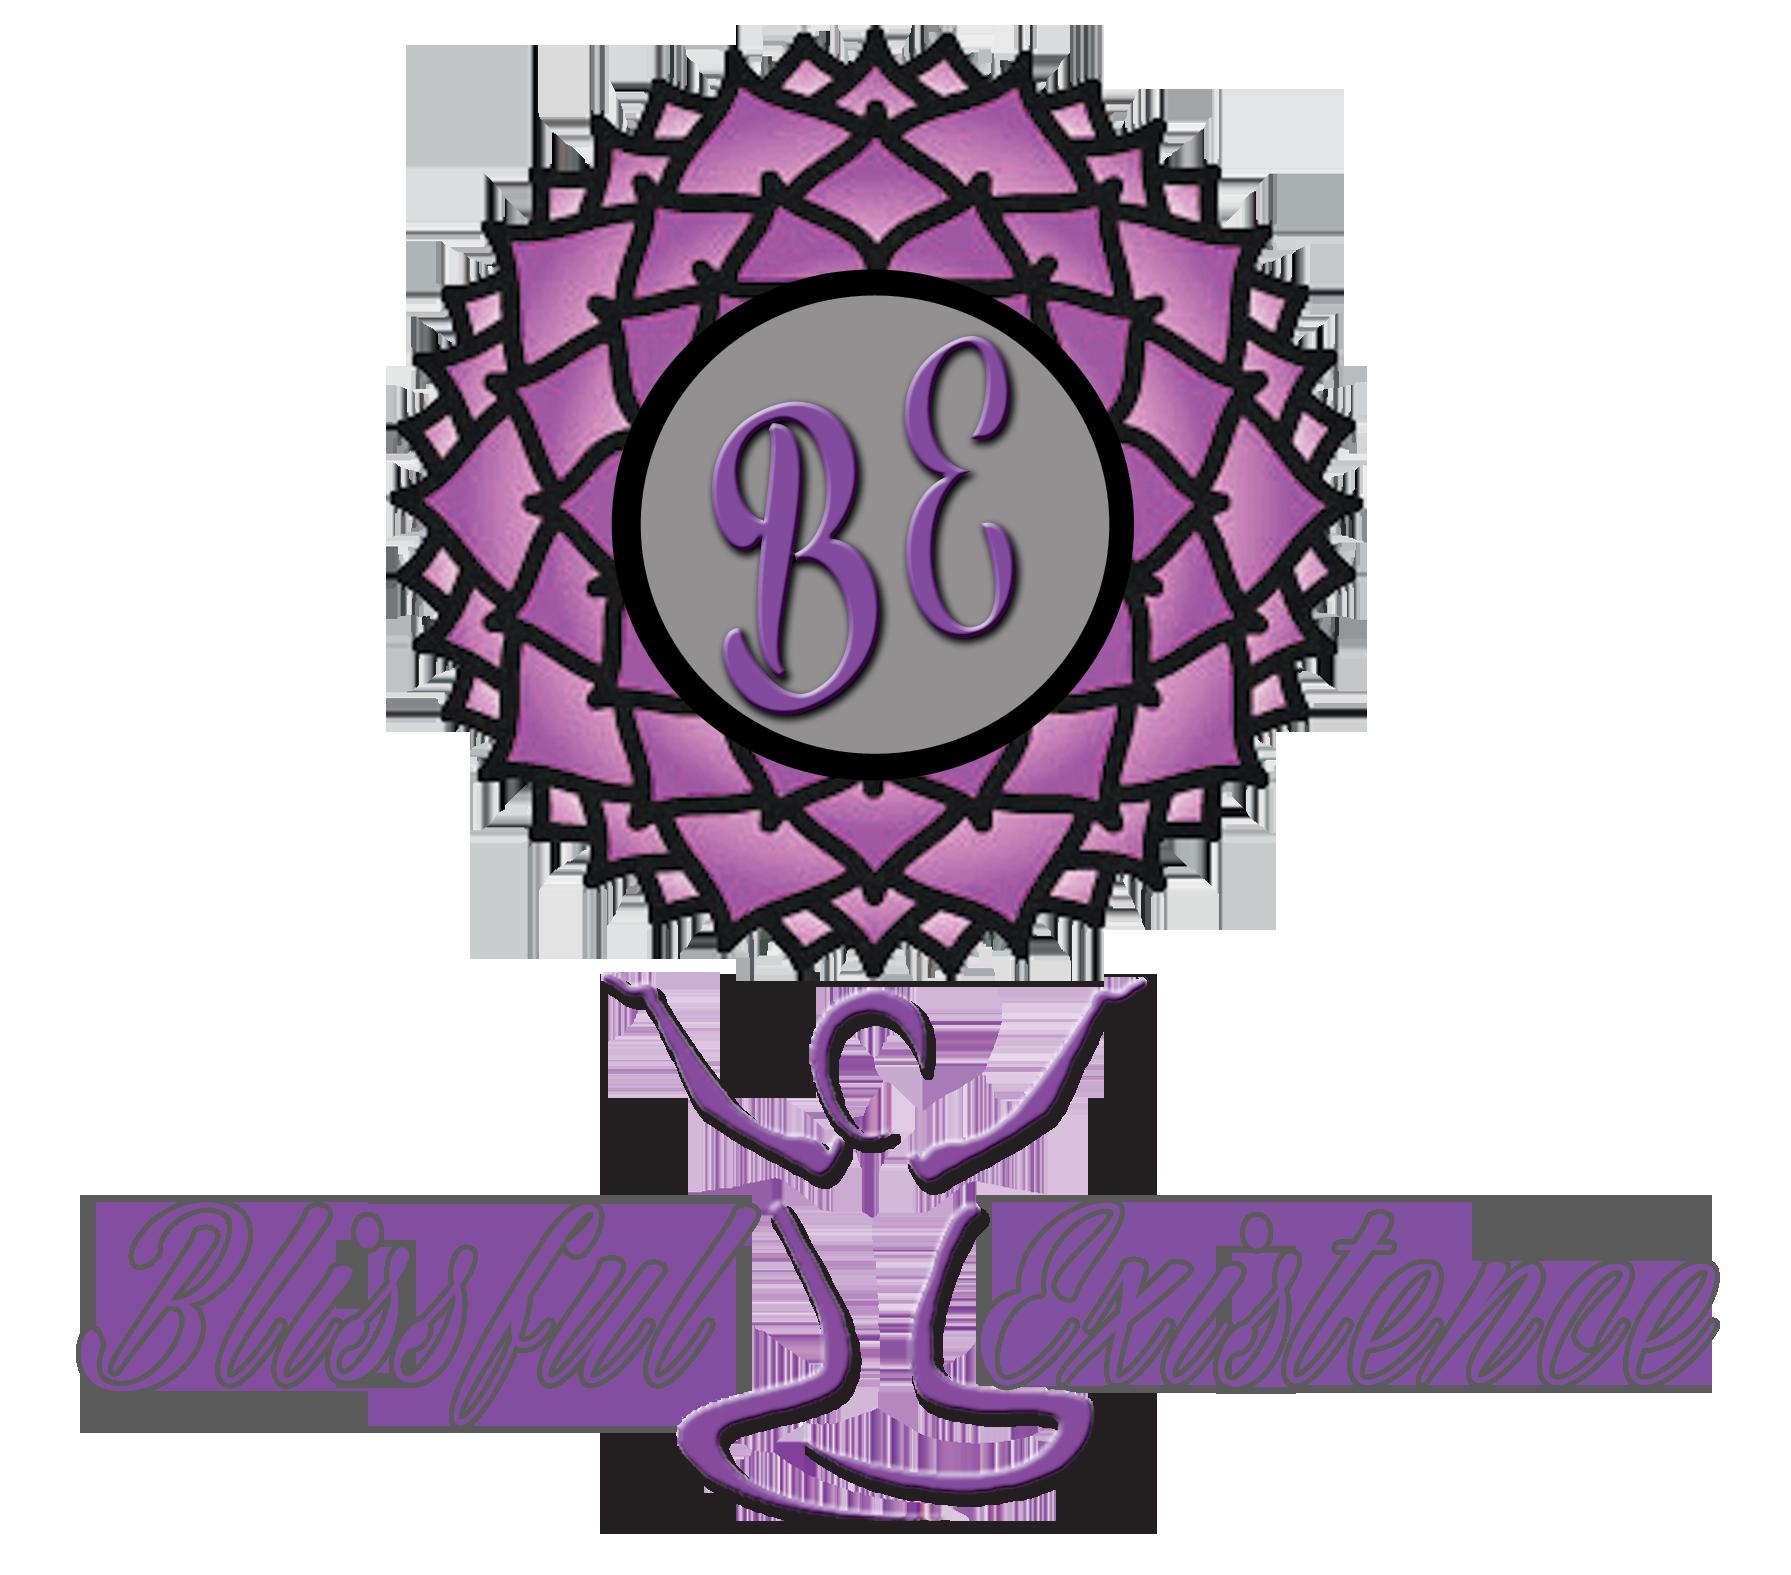 Logo for Blissful Existence! Website: www.blissfulexistence.us